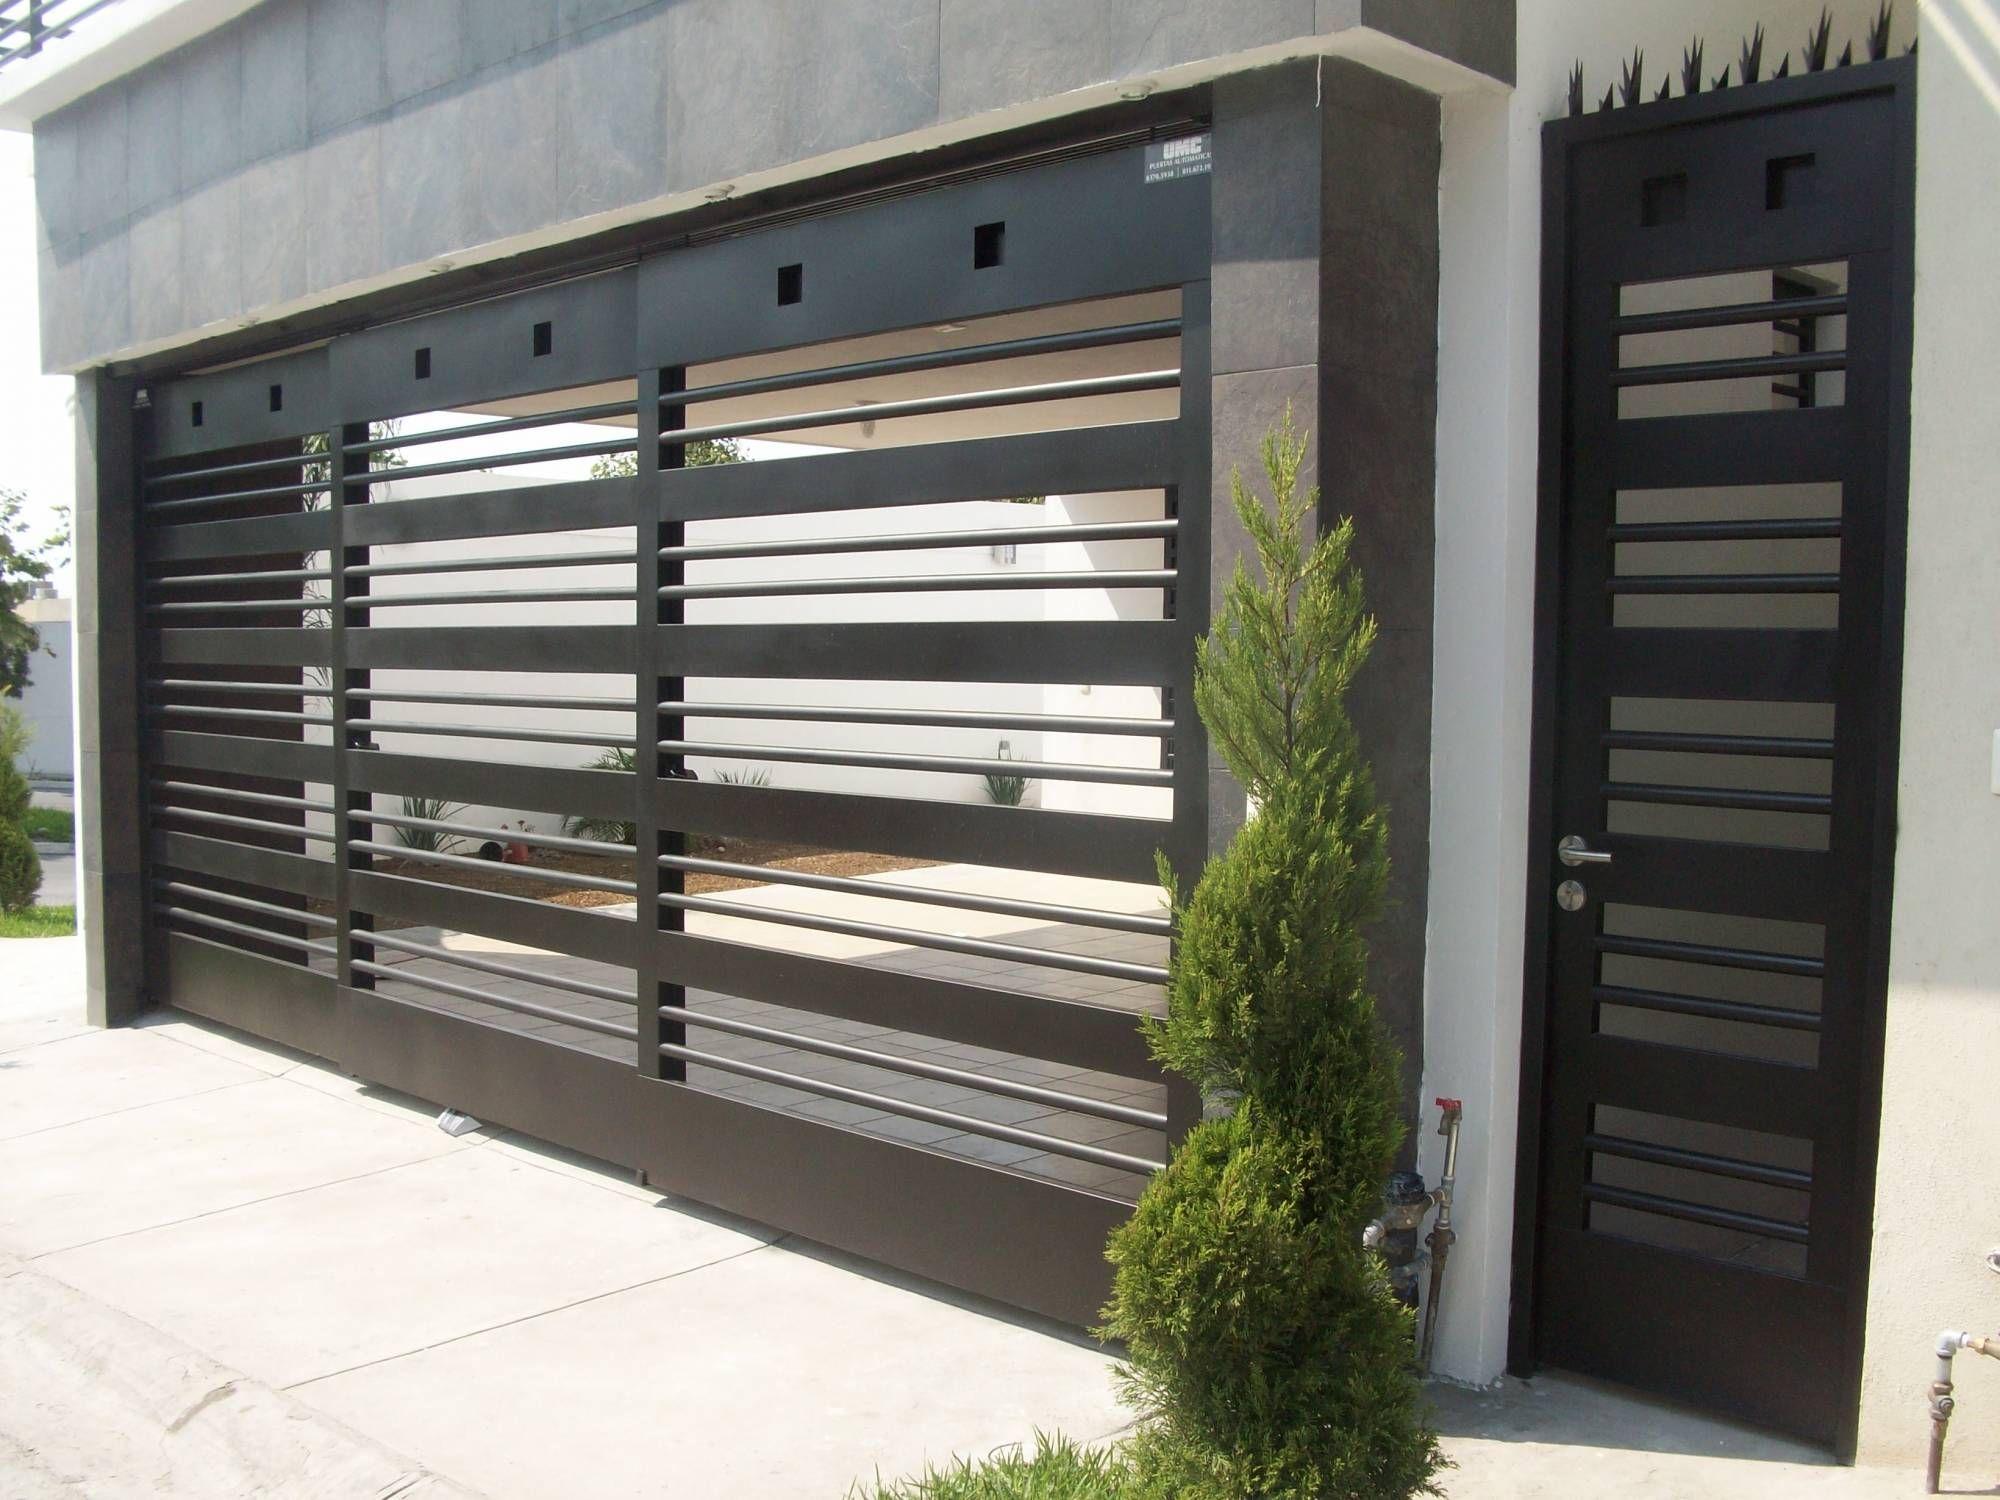 Puertas cocheras para puertas para cochera modelo - Puertas de cocheras ...